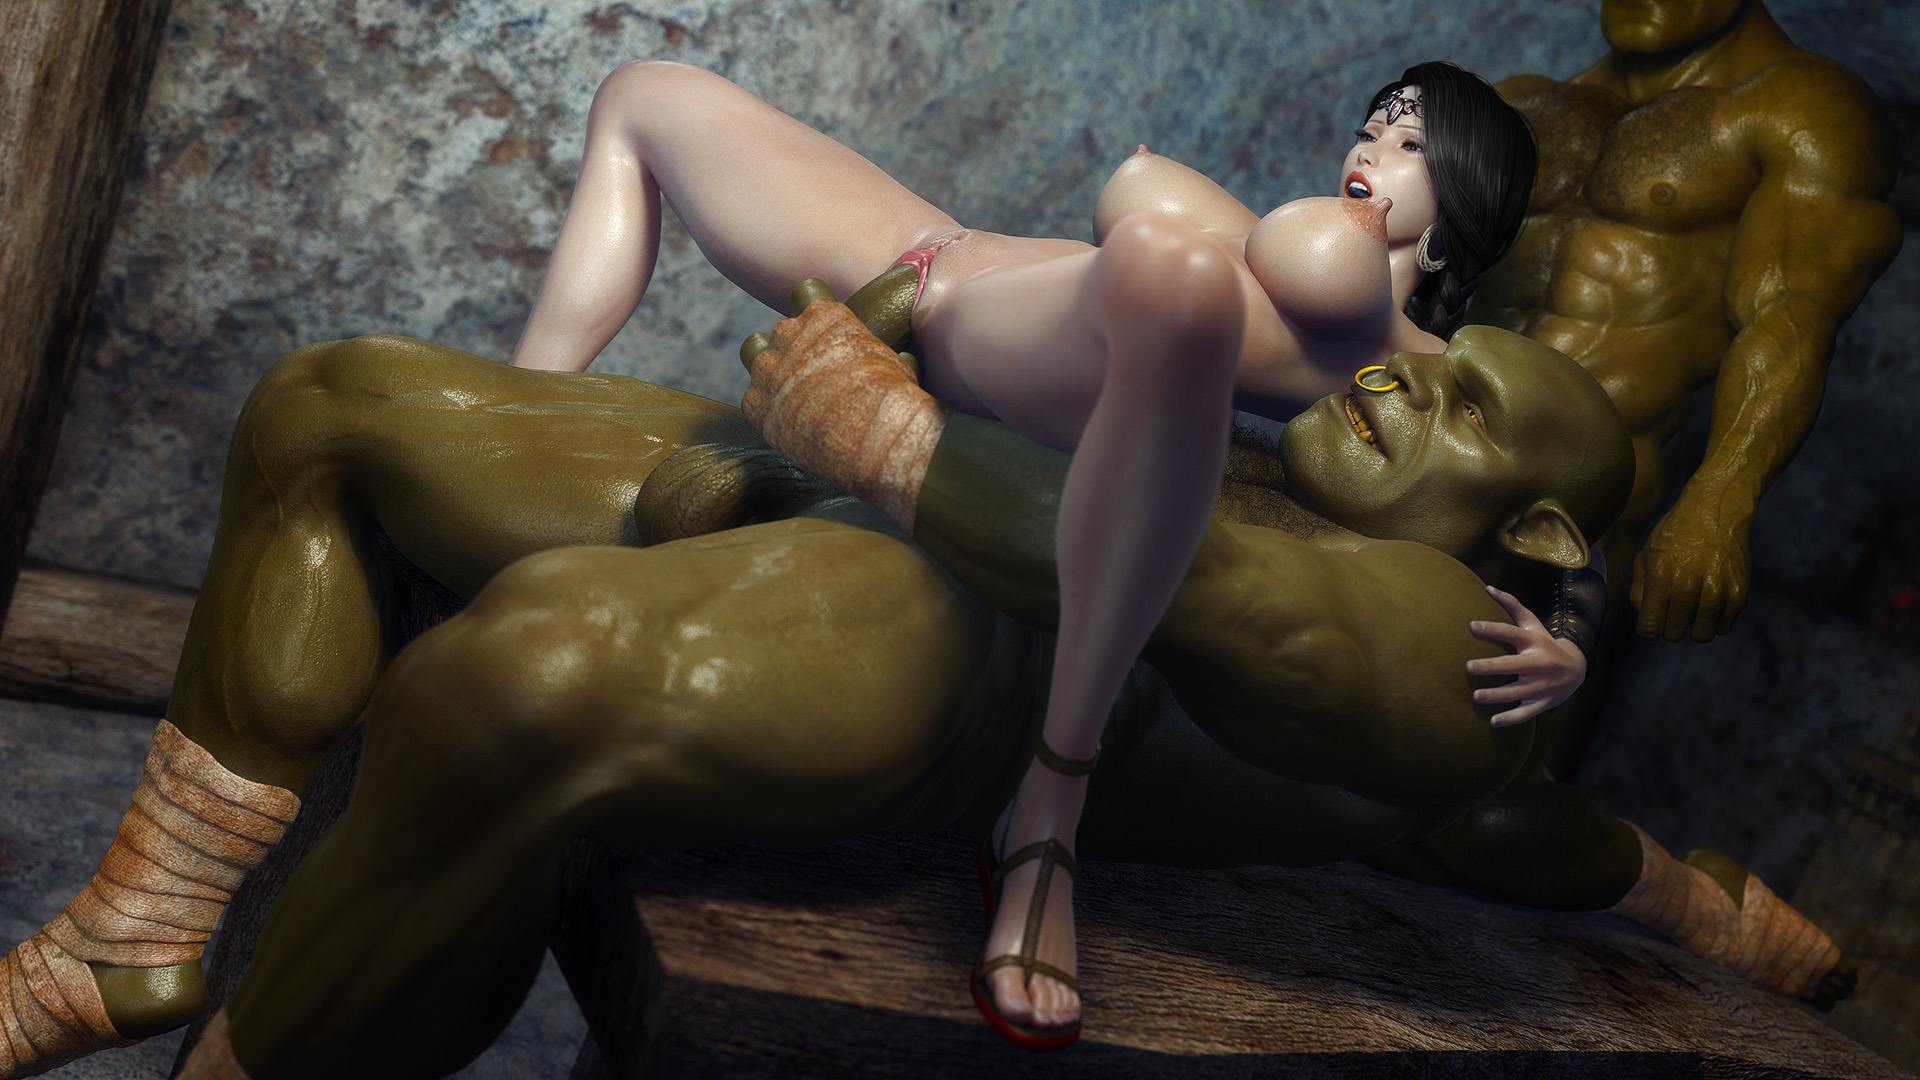 Порно мультик трахнули ельфийку фото 382-35